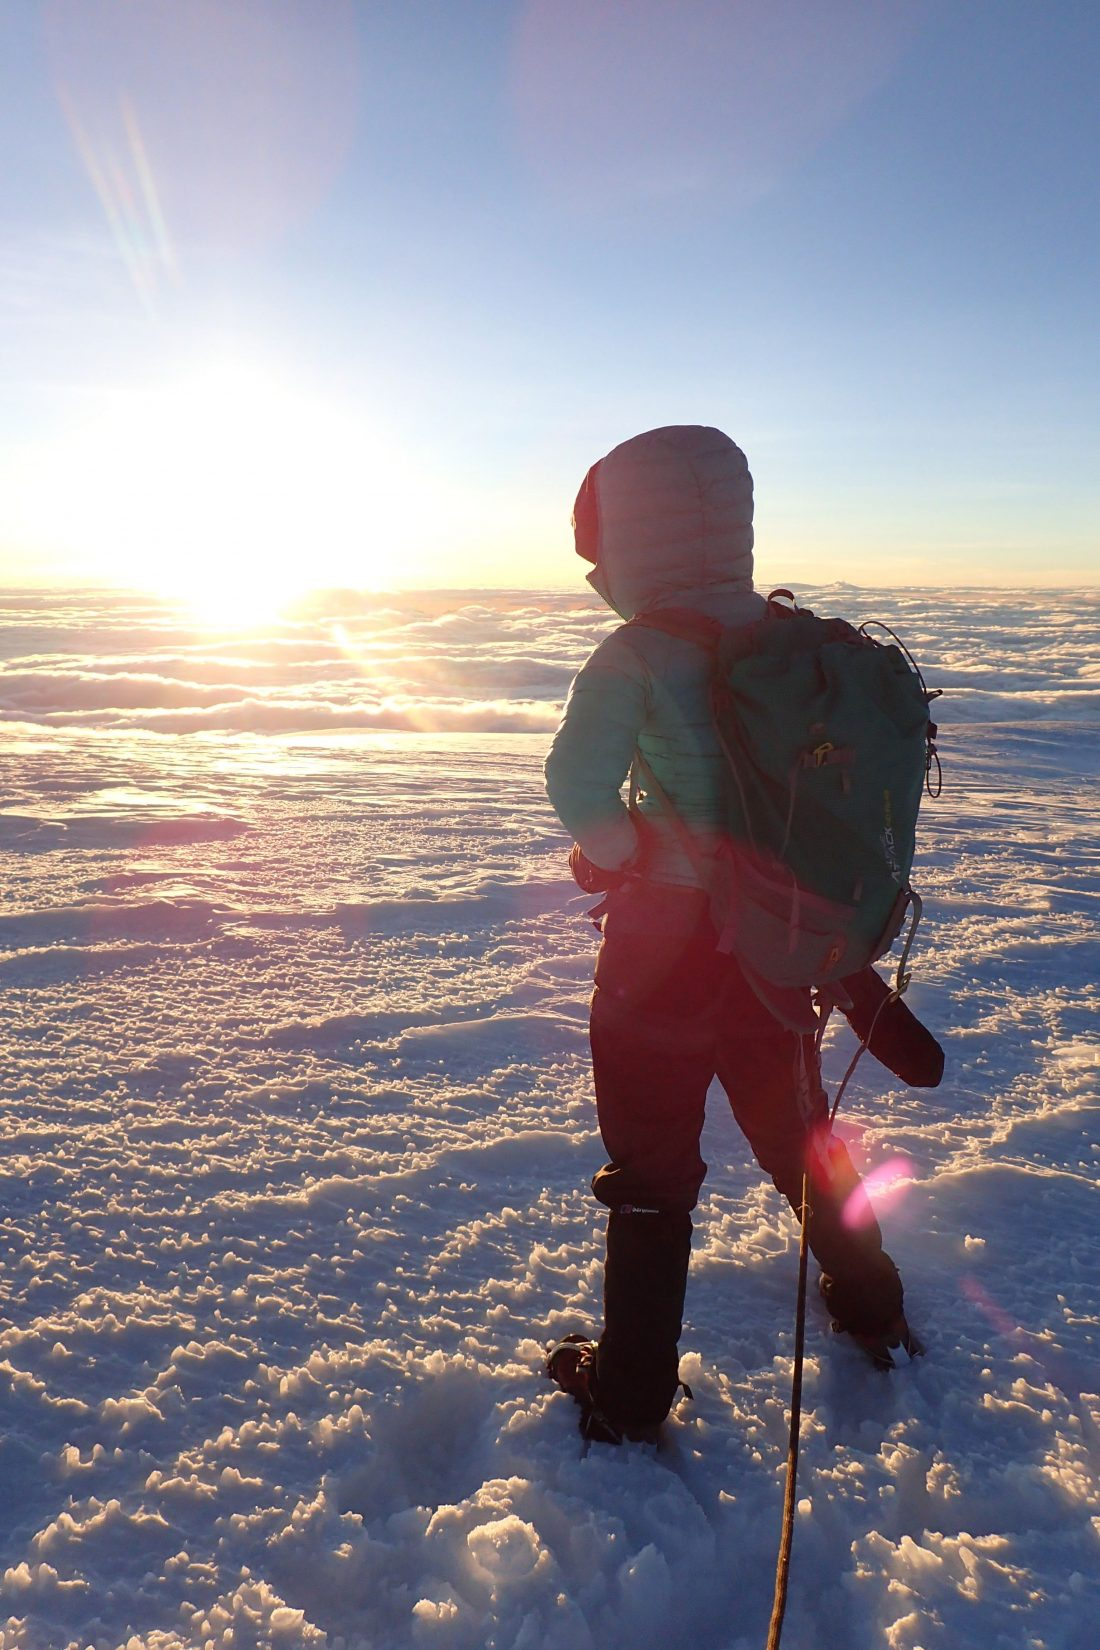 Here comes the sun - in het zonnetje - Wanderlotje - Chimborazo